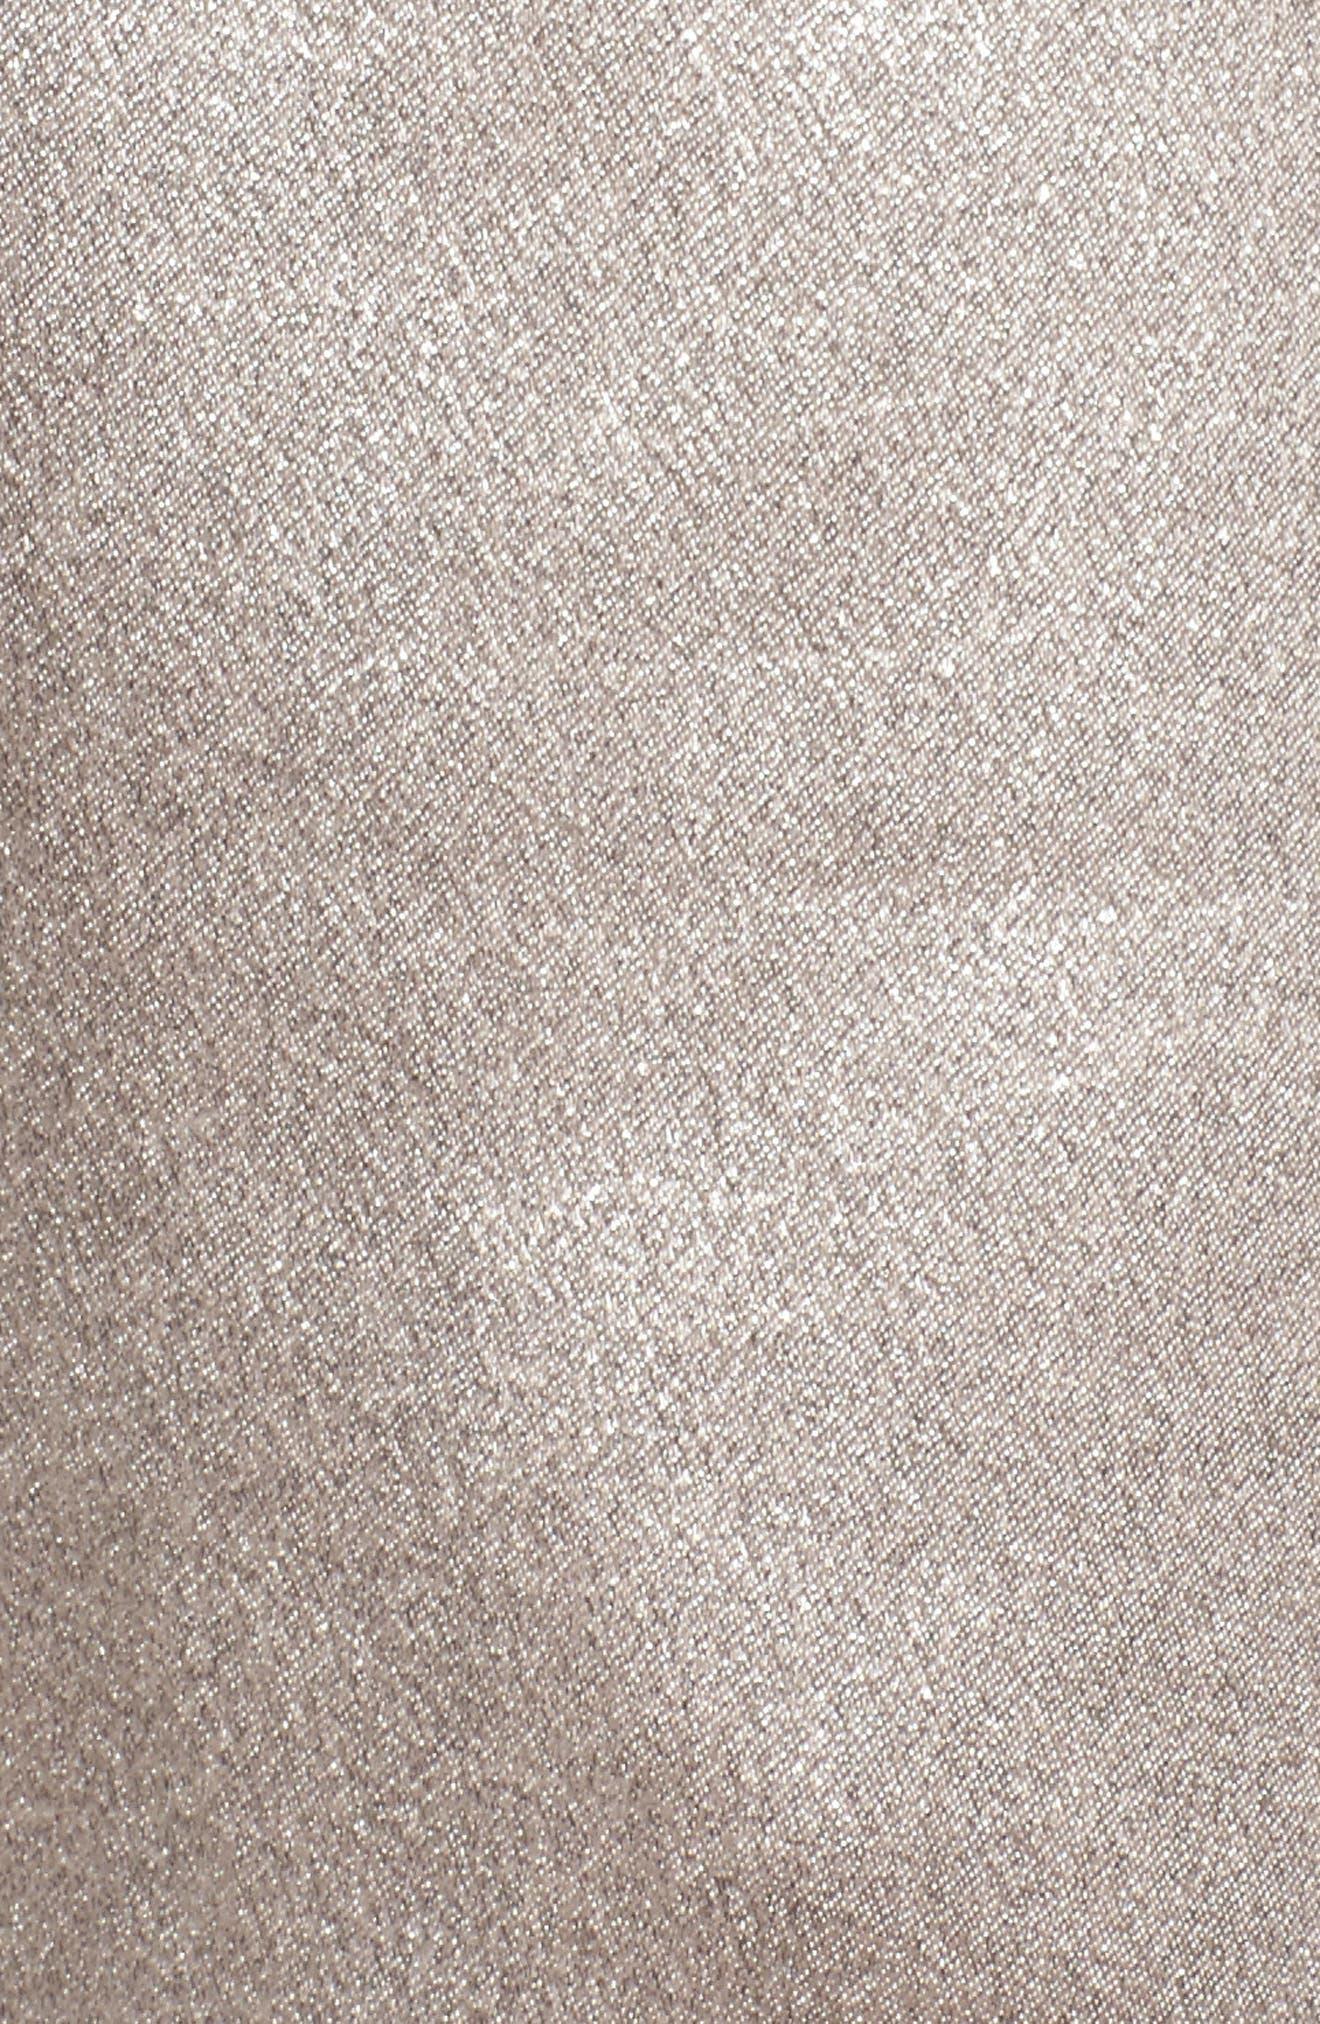 Satin High Waist Ankle Pants,                             Alternate thumbnail 6, color,                             Grey Chateau Metallic